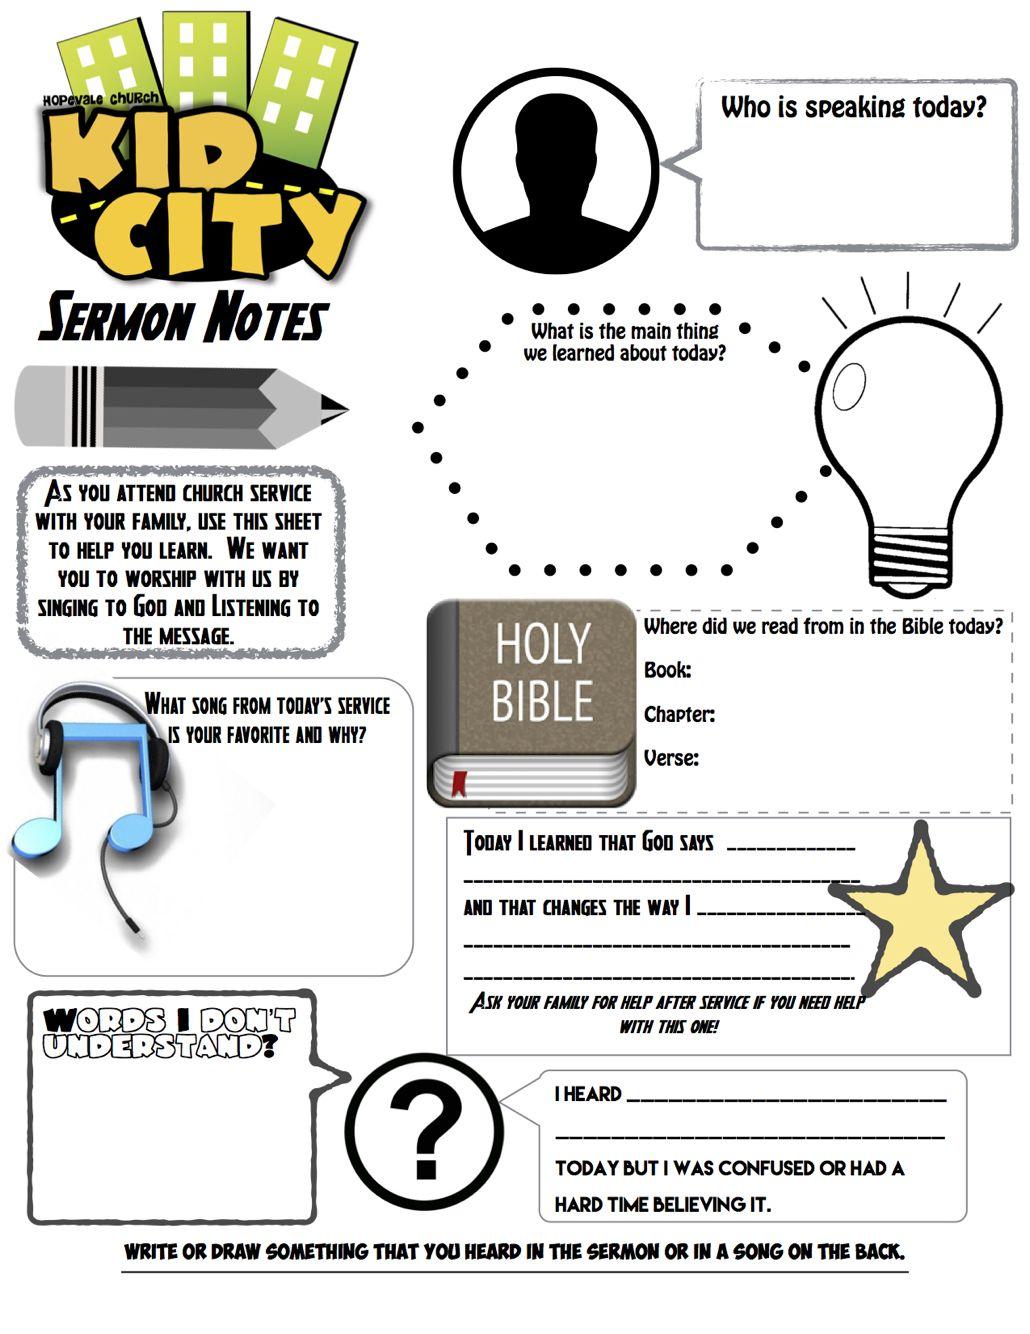 Sermon notes modified by jquinn hopevale church childrens sermon notes modified by jquinn hopevale church sermon notes notes template maxwellsz